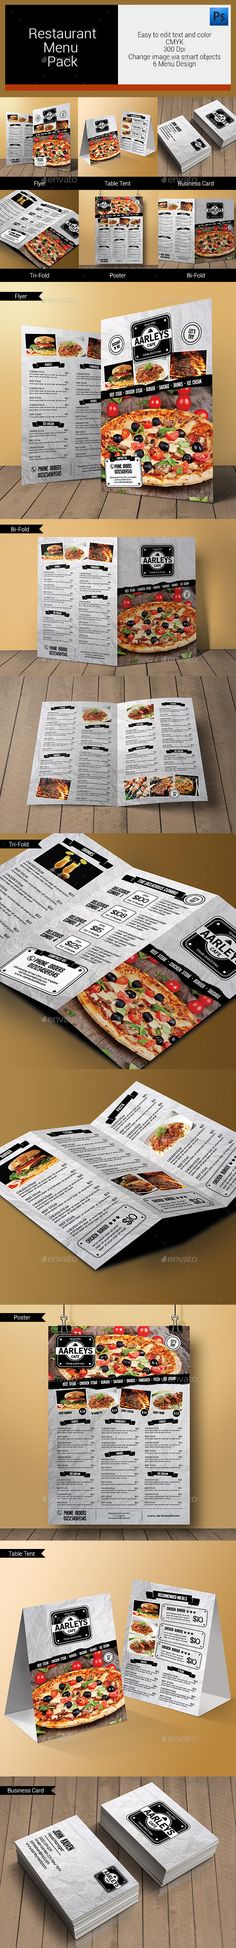 Vintage A3 Food Menu - 3 Color Versions Food menu, Print templates